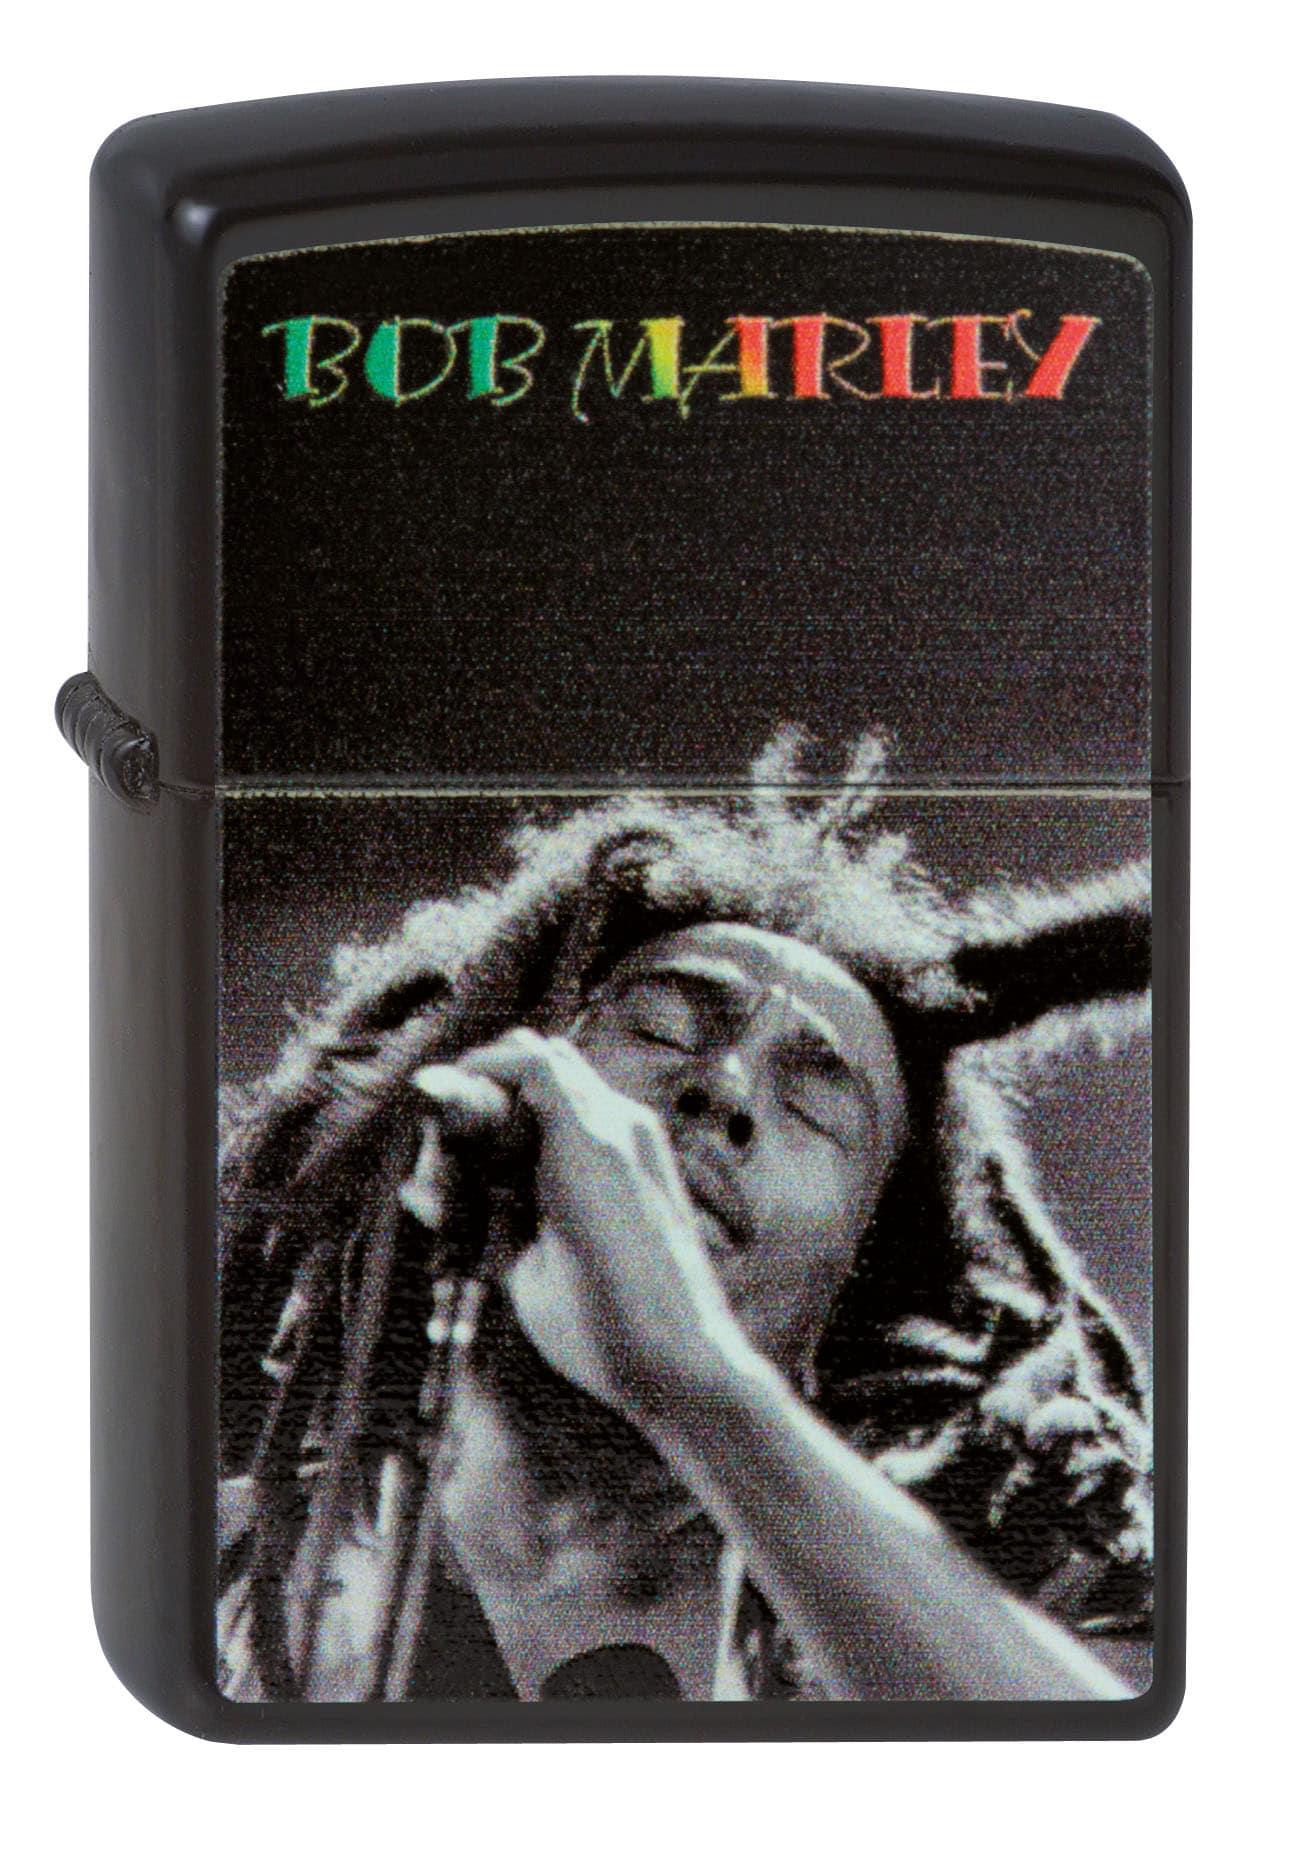 Zippo bob marley 811240 achat briquet zippo 49 00 for Exterieur zippo